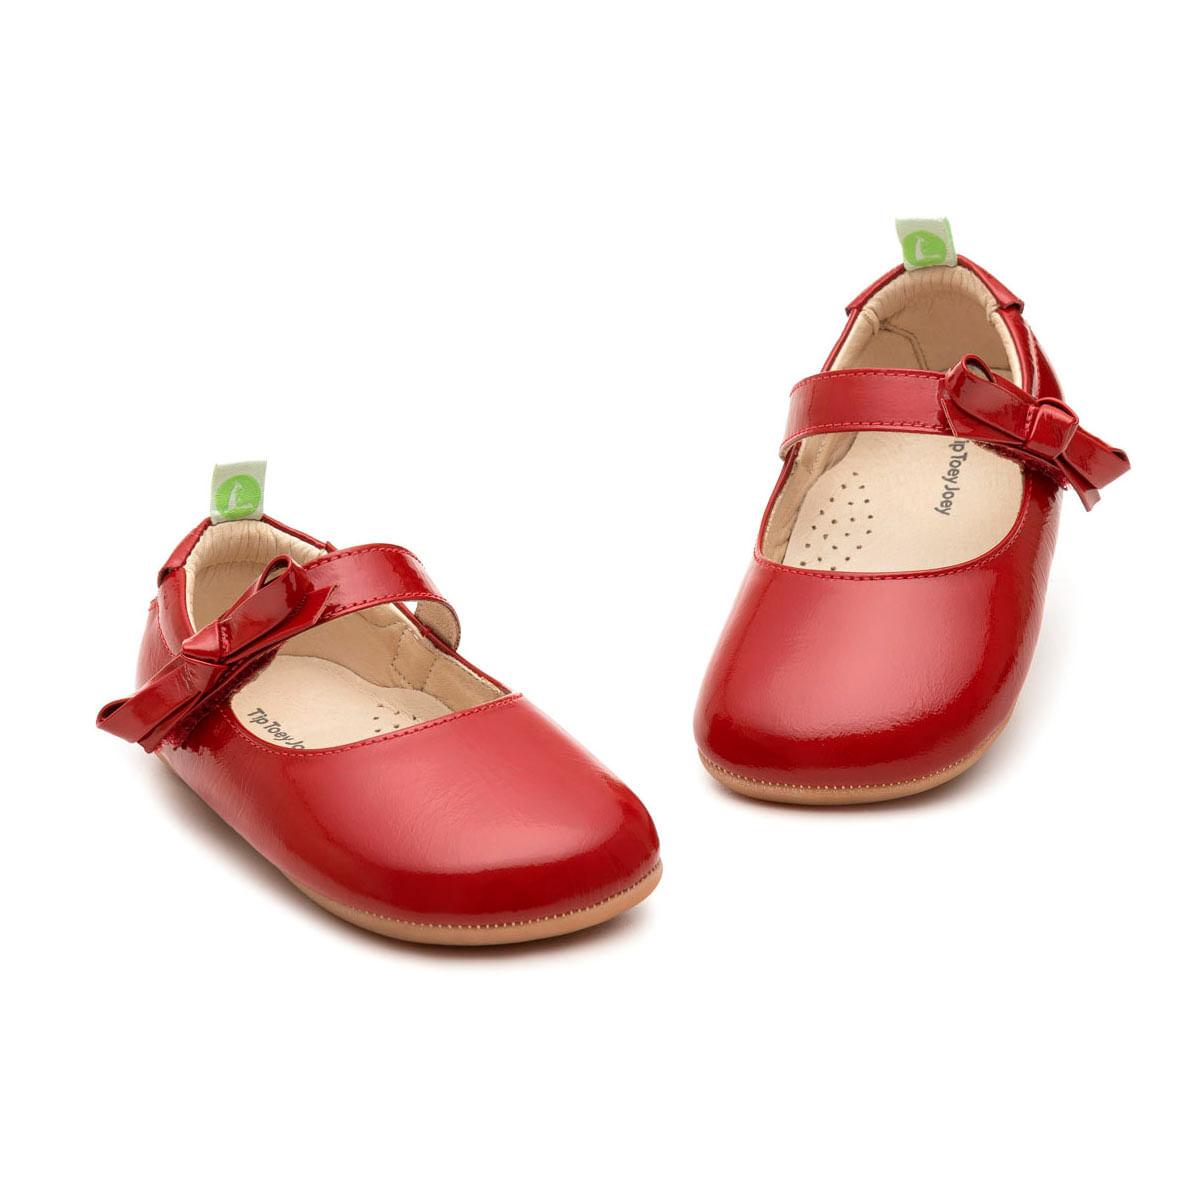 Sapatilha-Infantil-Tip-Toey-Joey-Baby-Dorothy--17-ao-23--B.DOT2S--ESSENTIALS21-